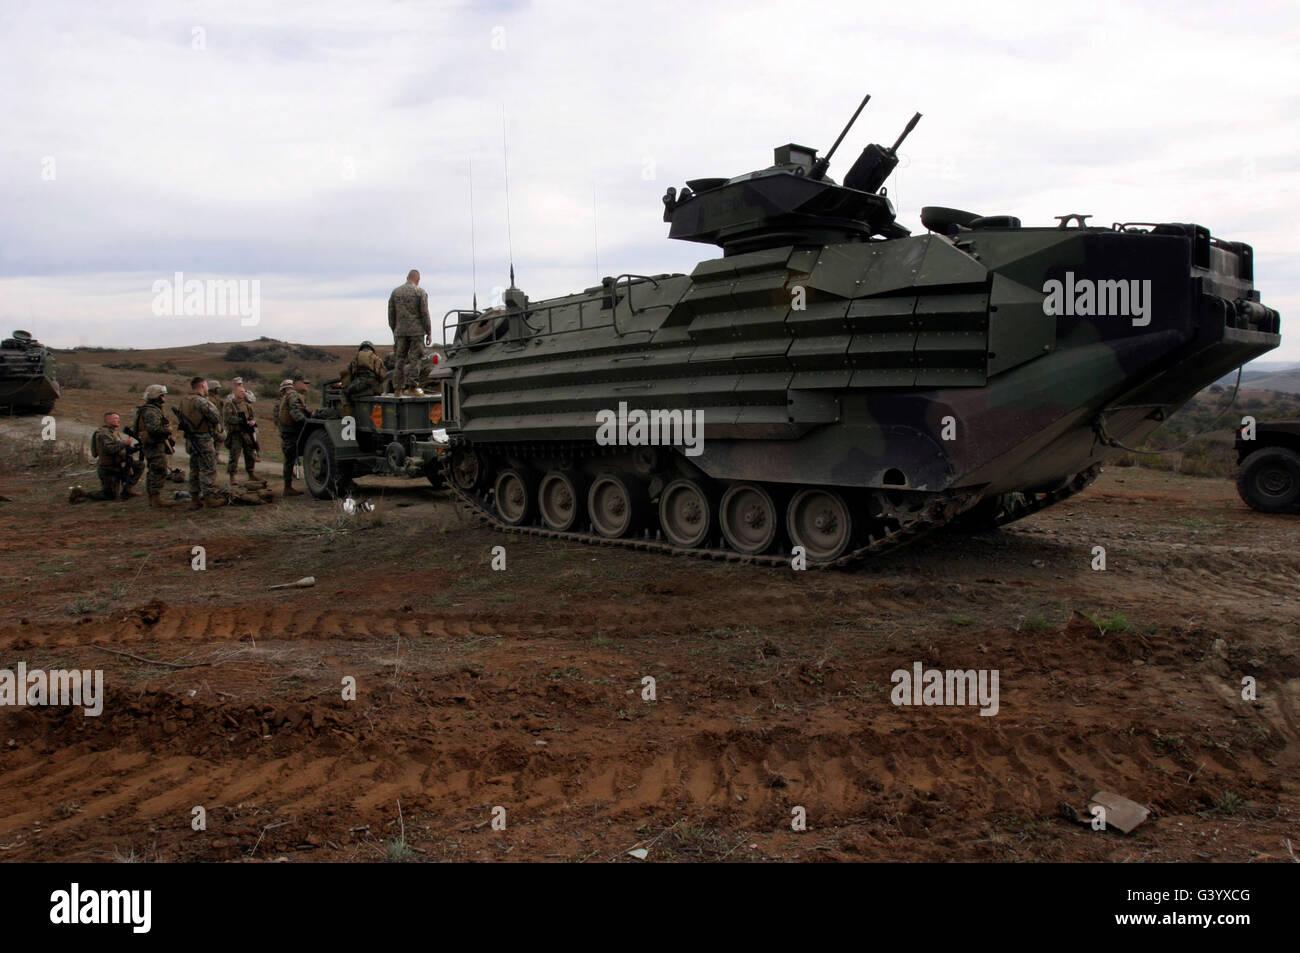 An Amphibious Assault Vehicle. Stock Photo